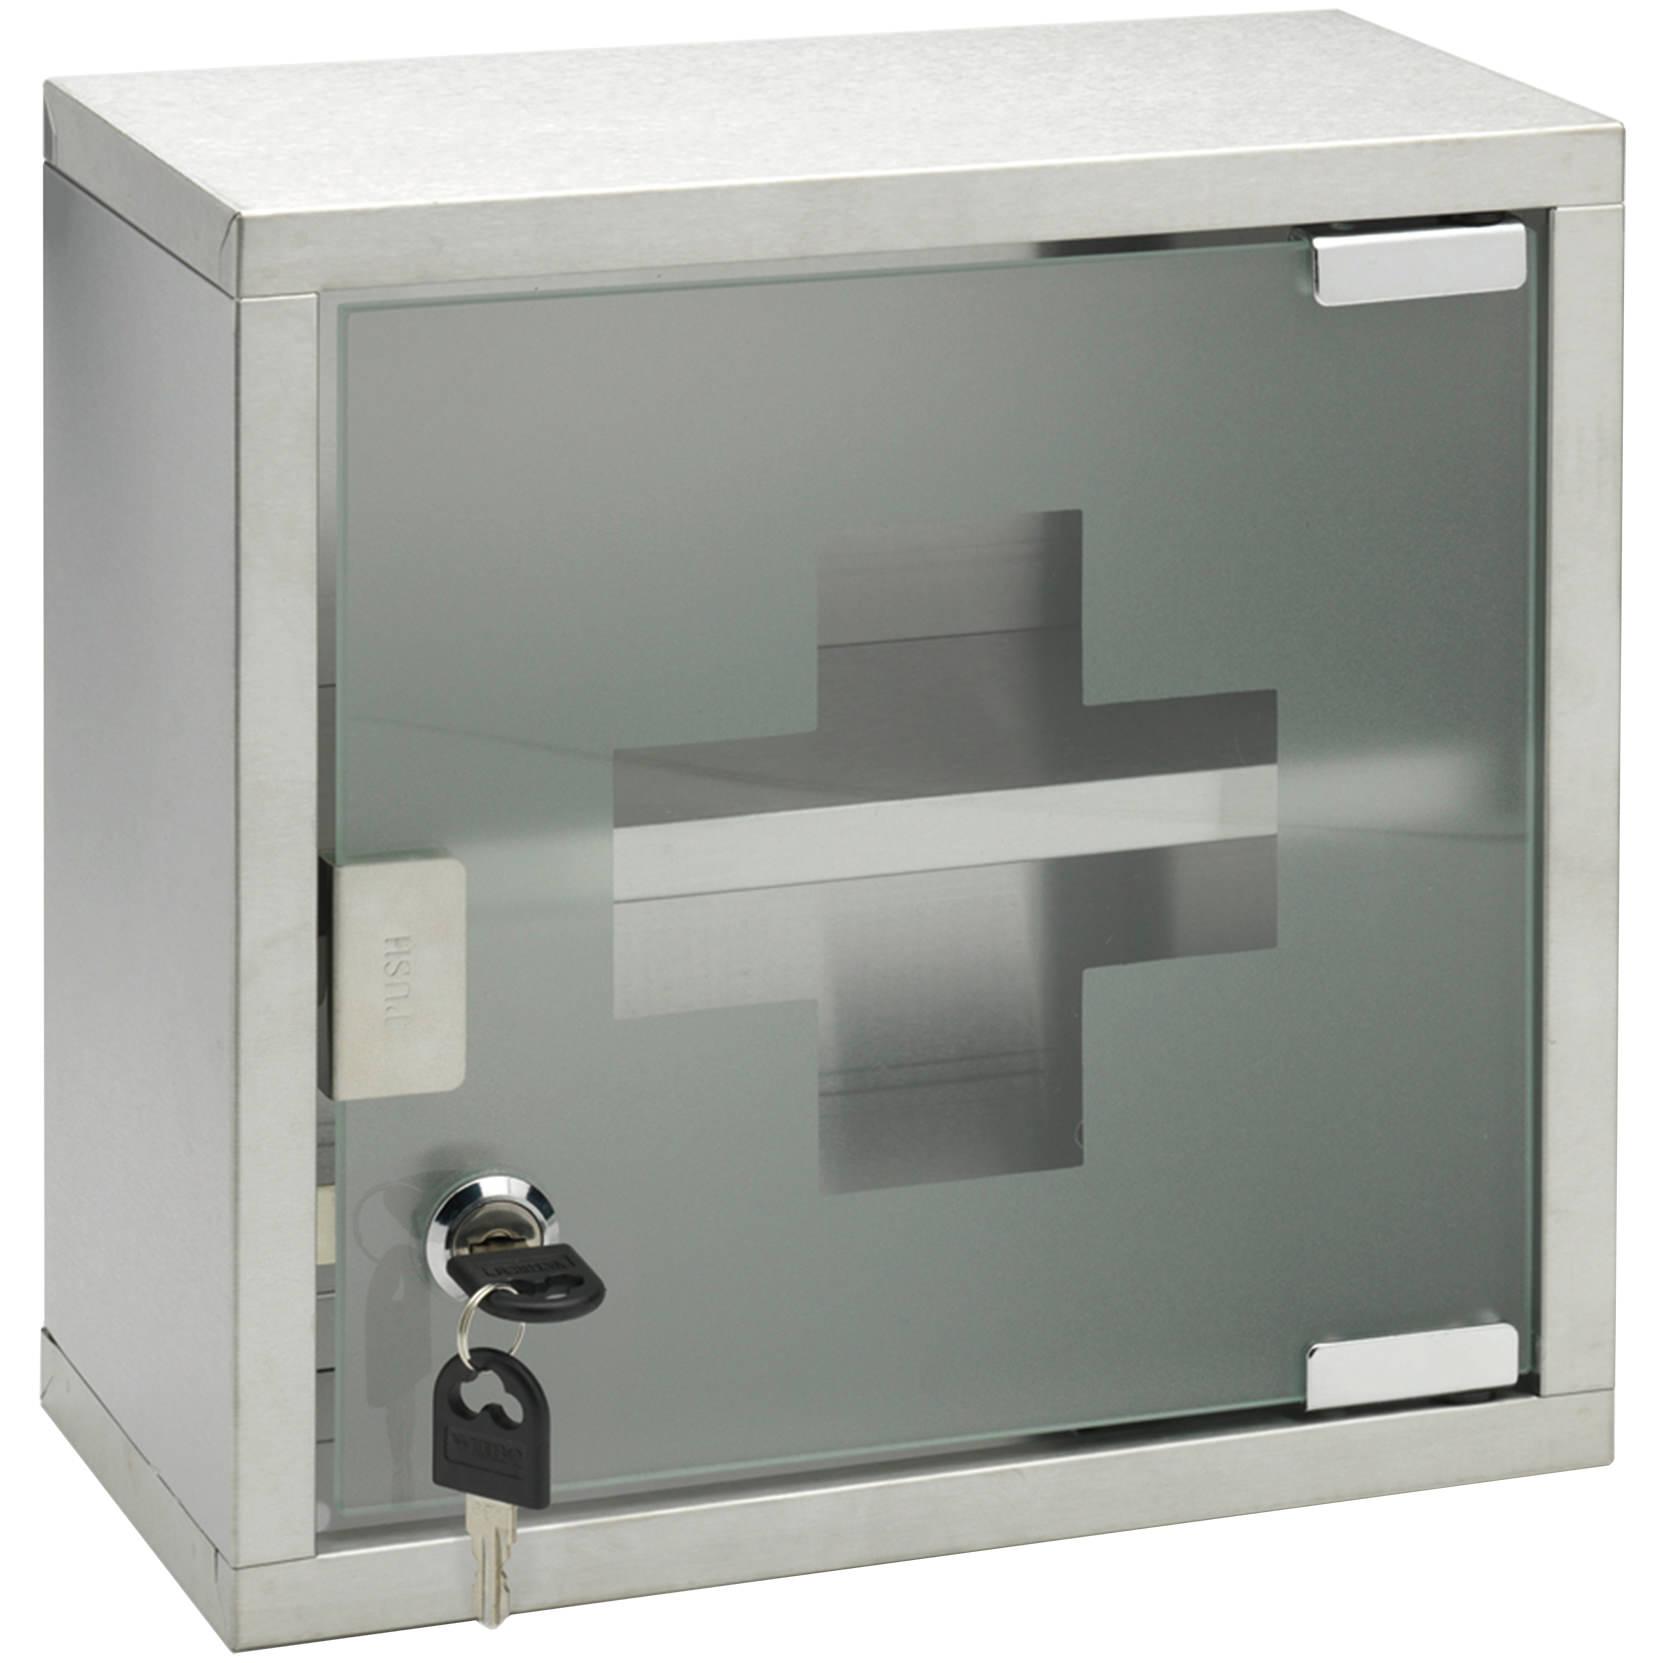 Sagittarius 250 x 250mm lockable medicine cabinet ac 313 c for Bathroom cabinets 250mm